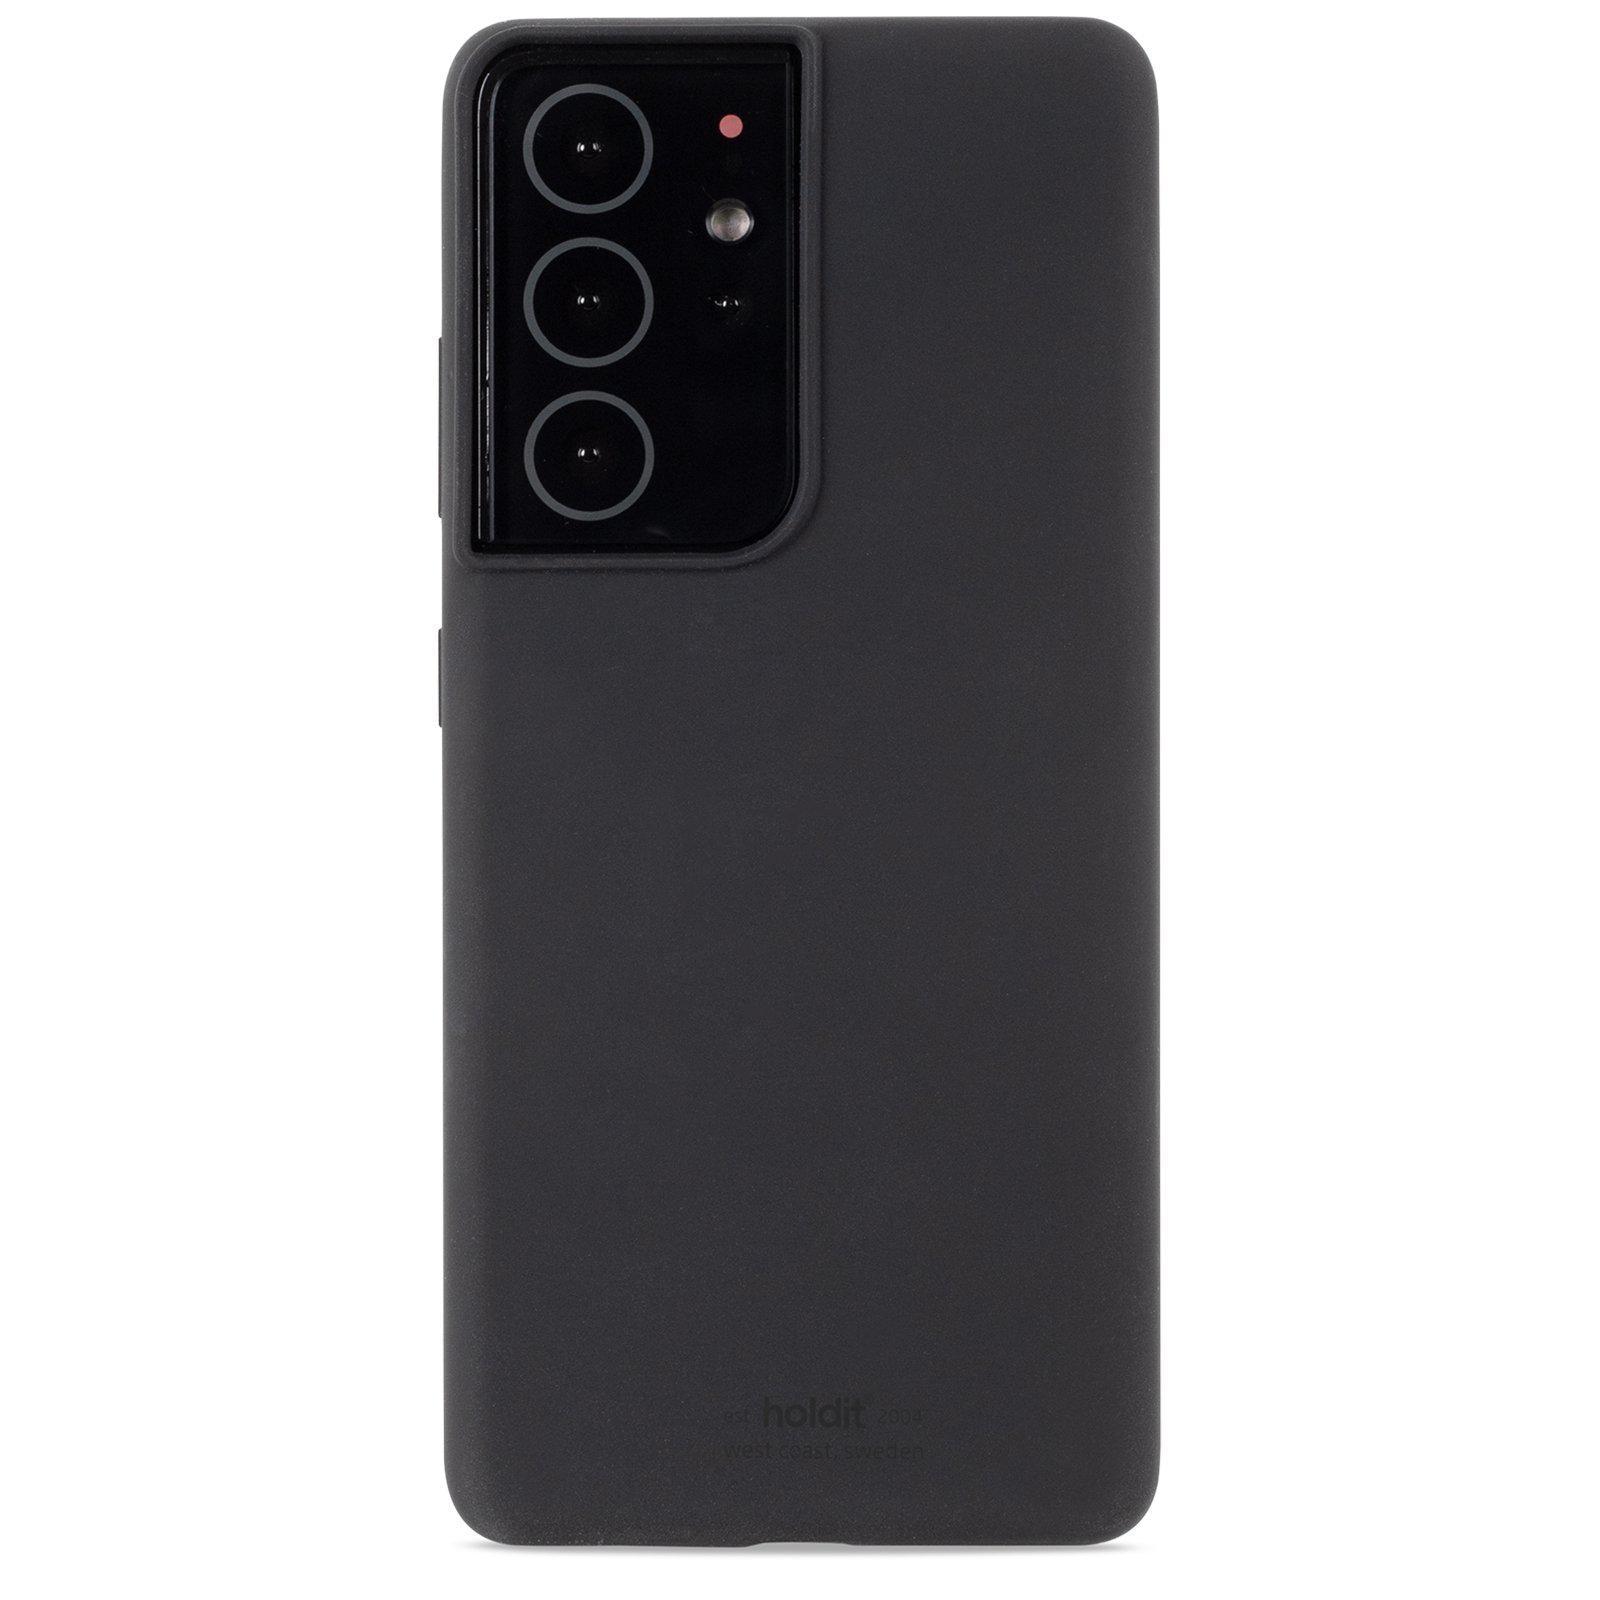 Silikonskal Galaxy S21 Ultra Black